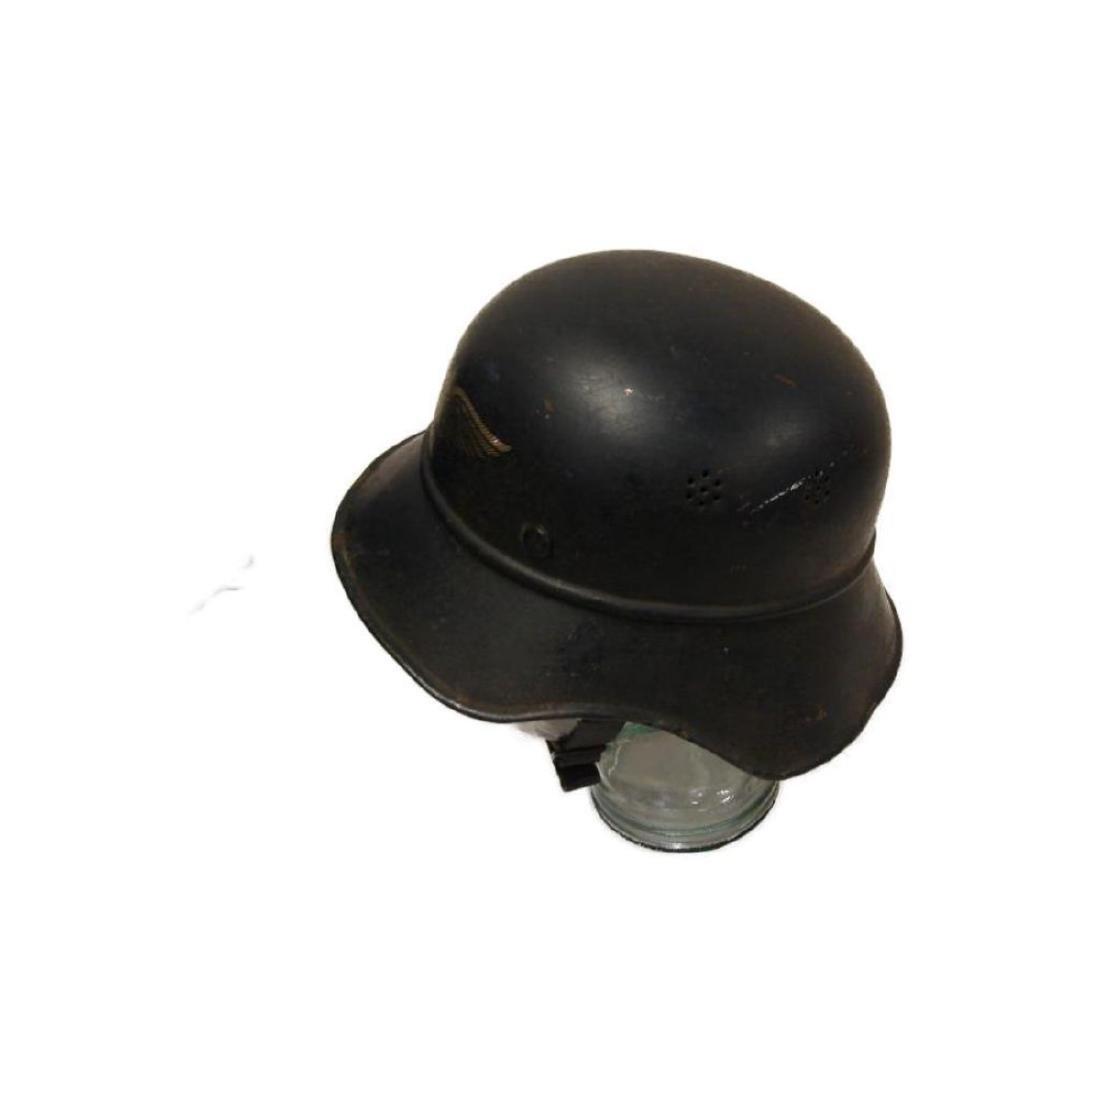 WWII Nazi German Luftschutz Helmet - 6